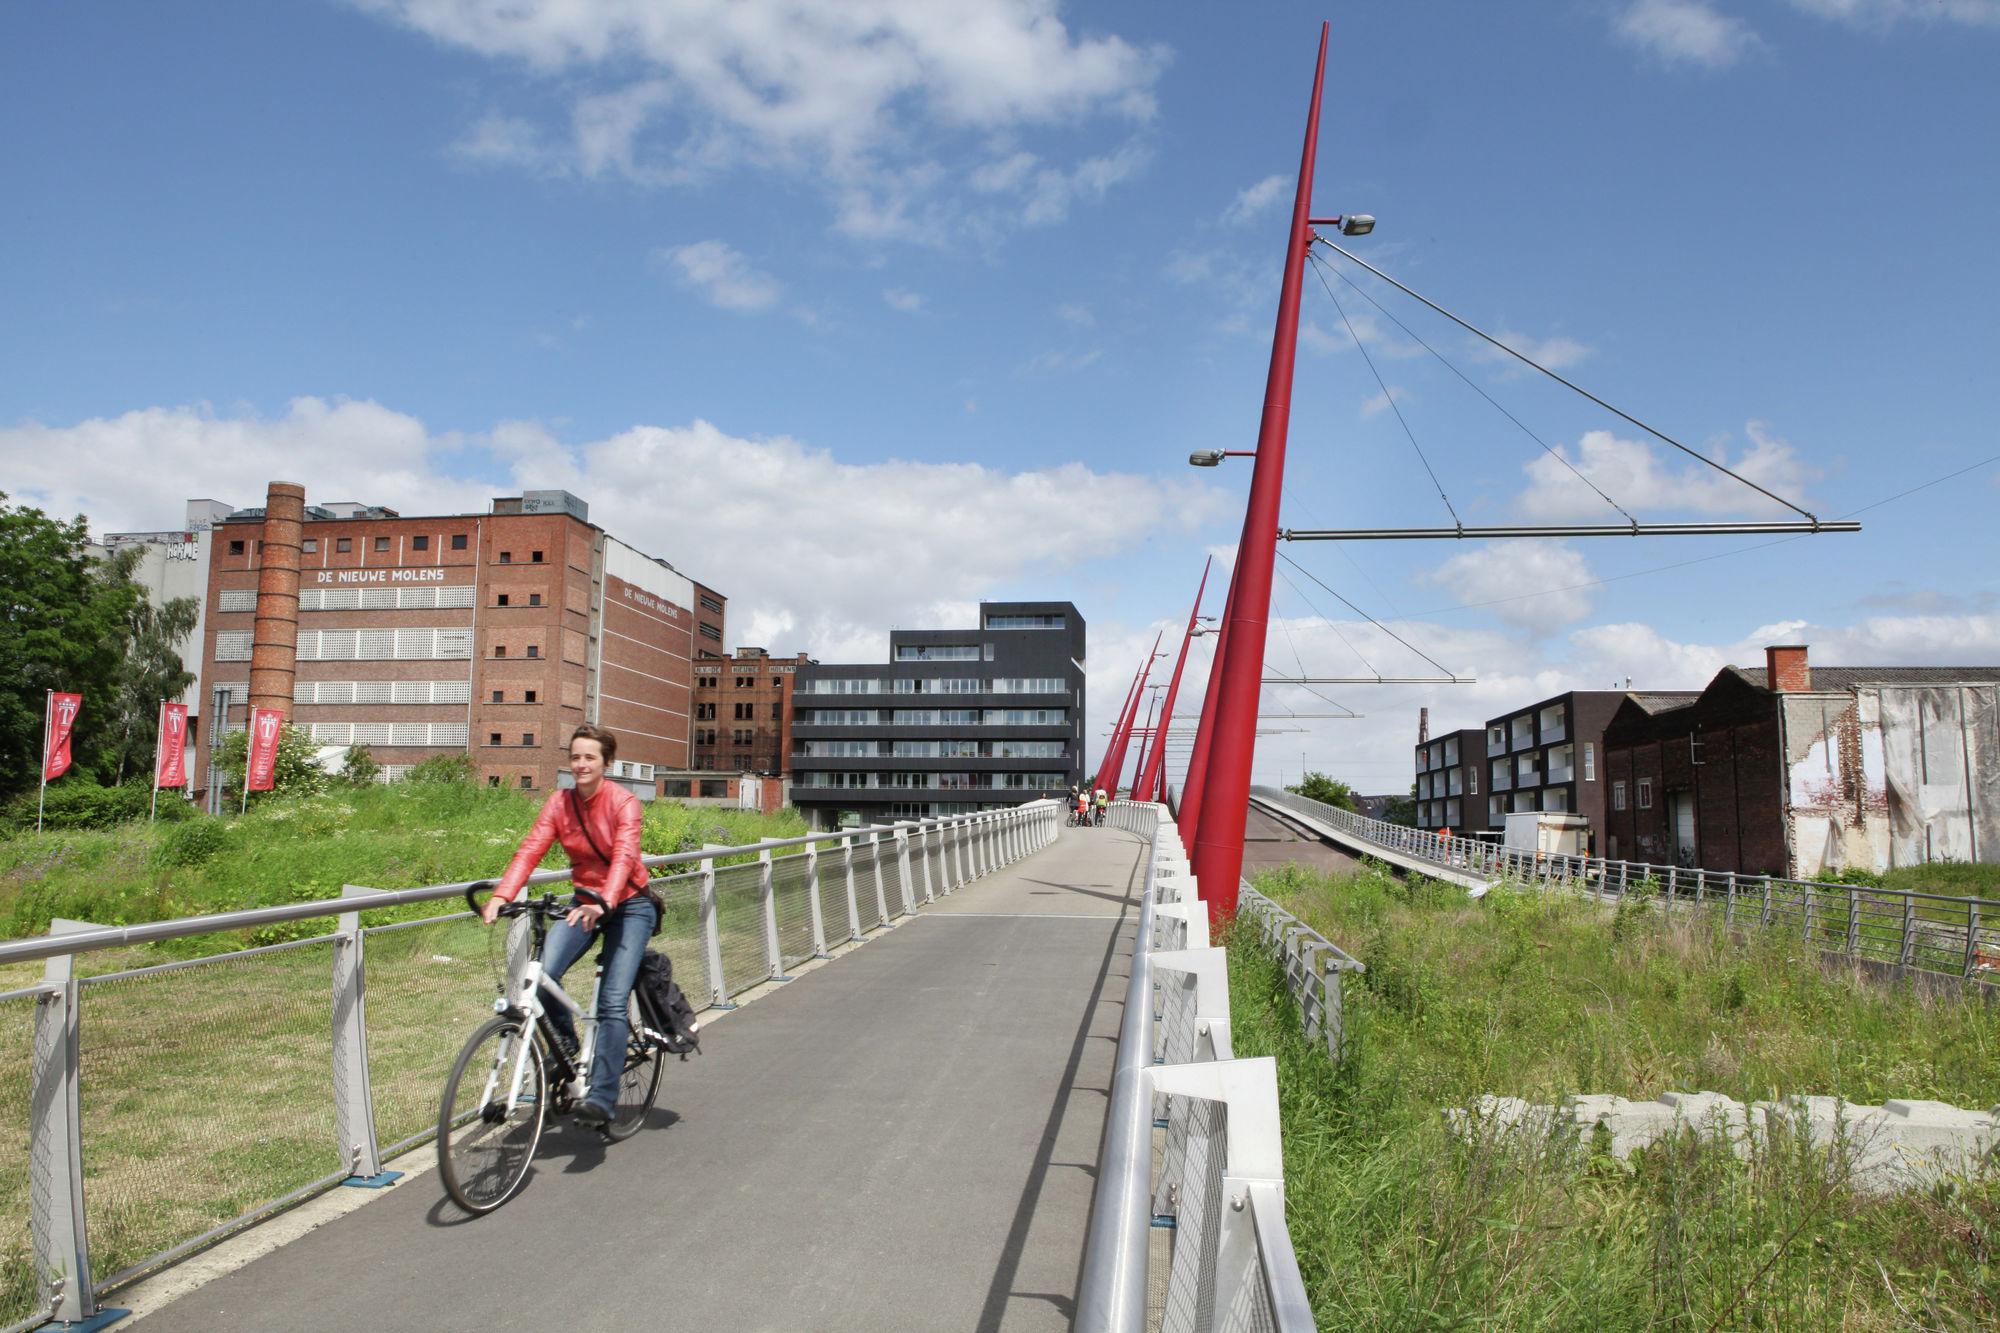 gaardeniersbrug en nieuwe molens (1)©Layla Aerts.jpg